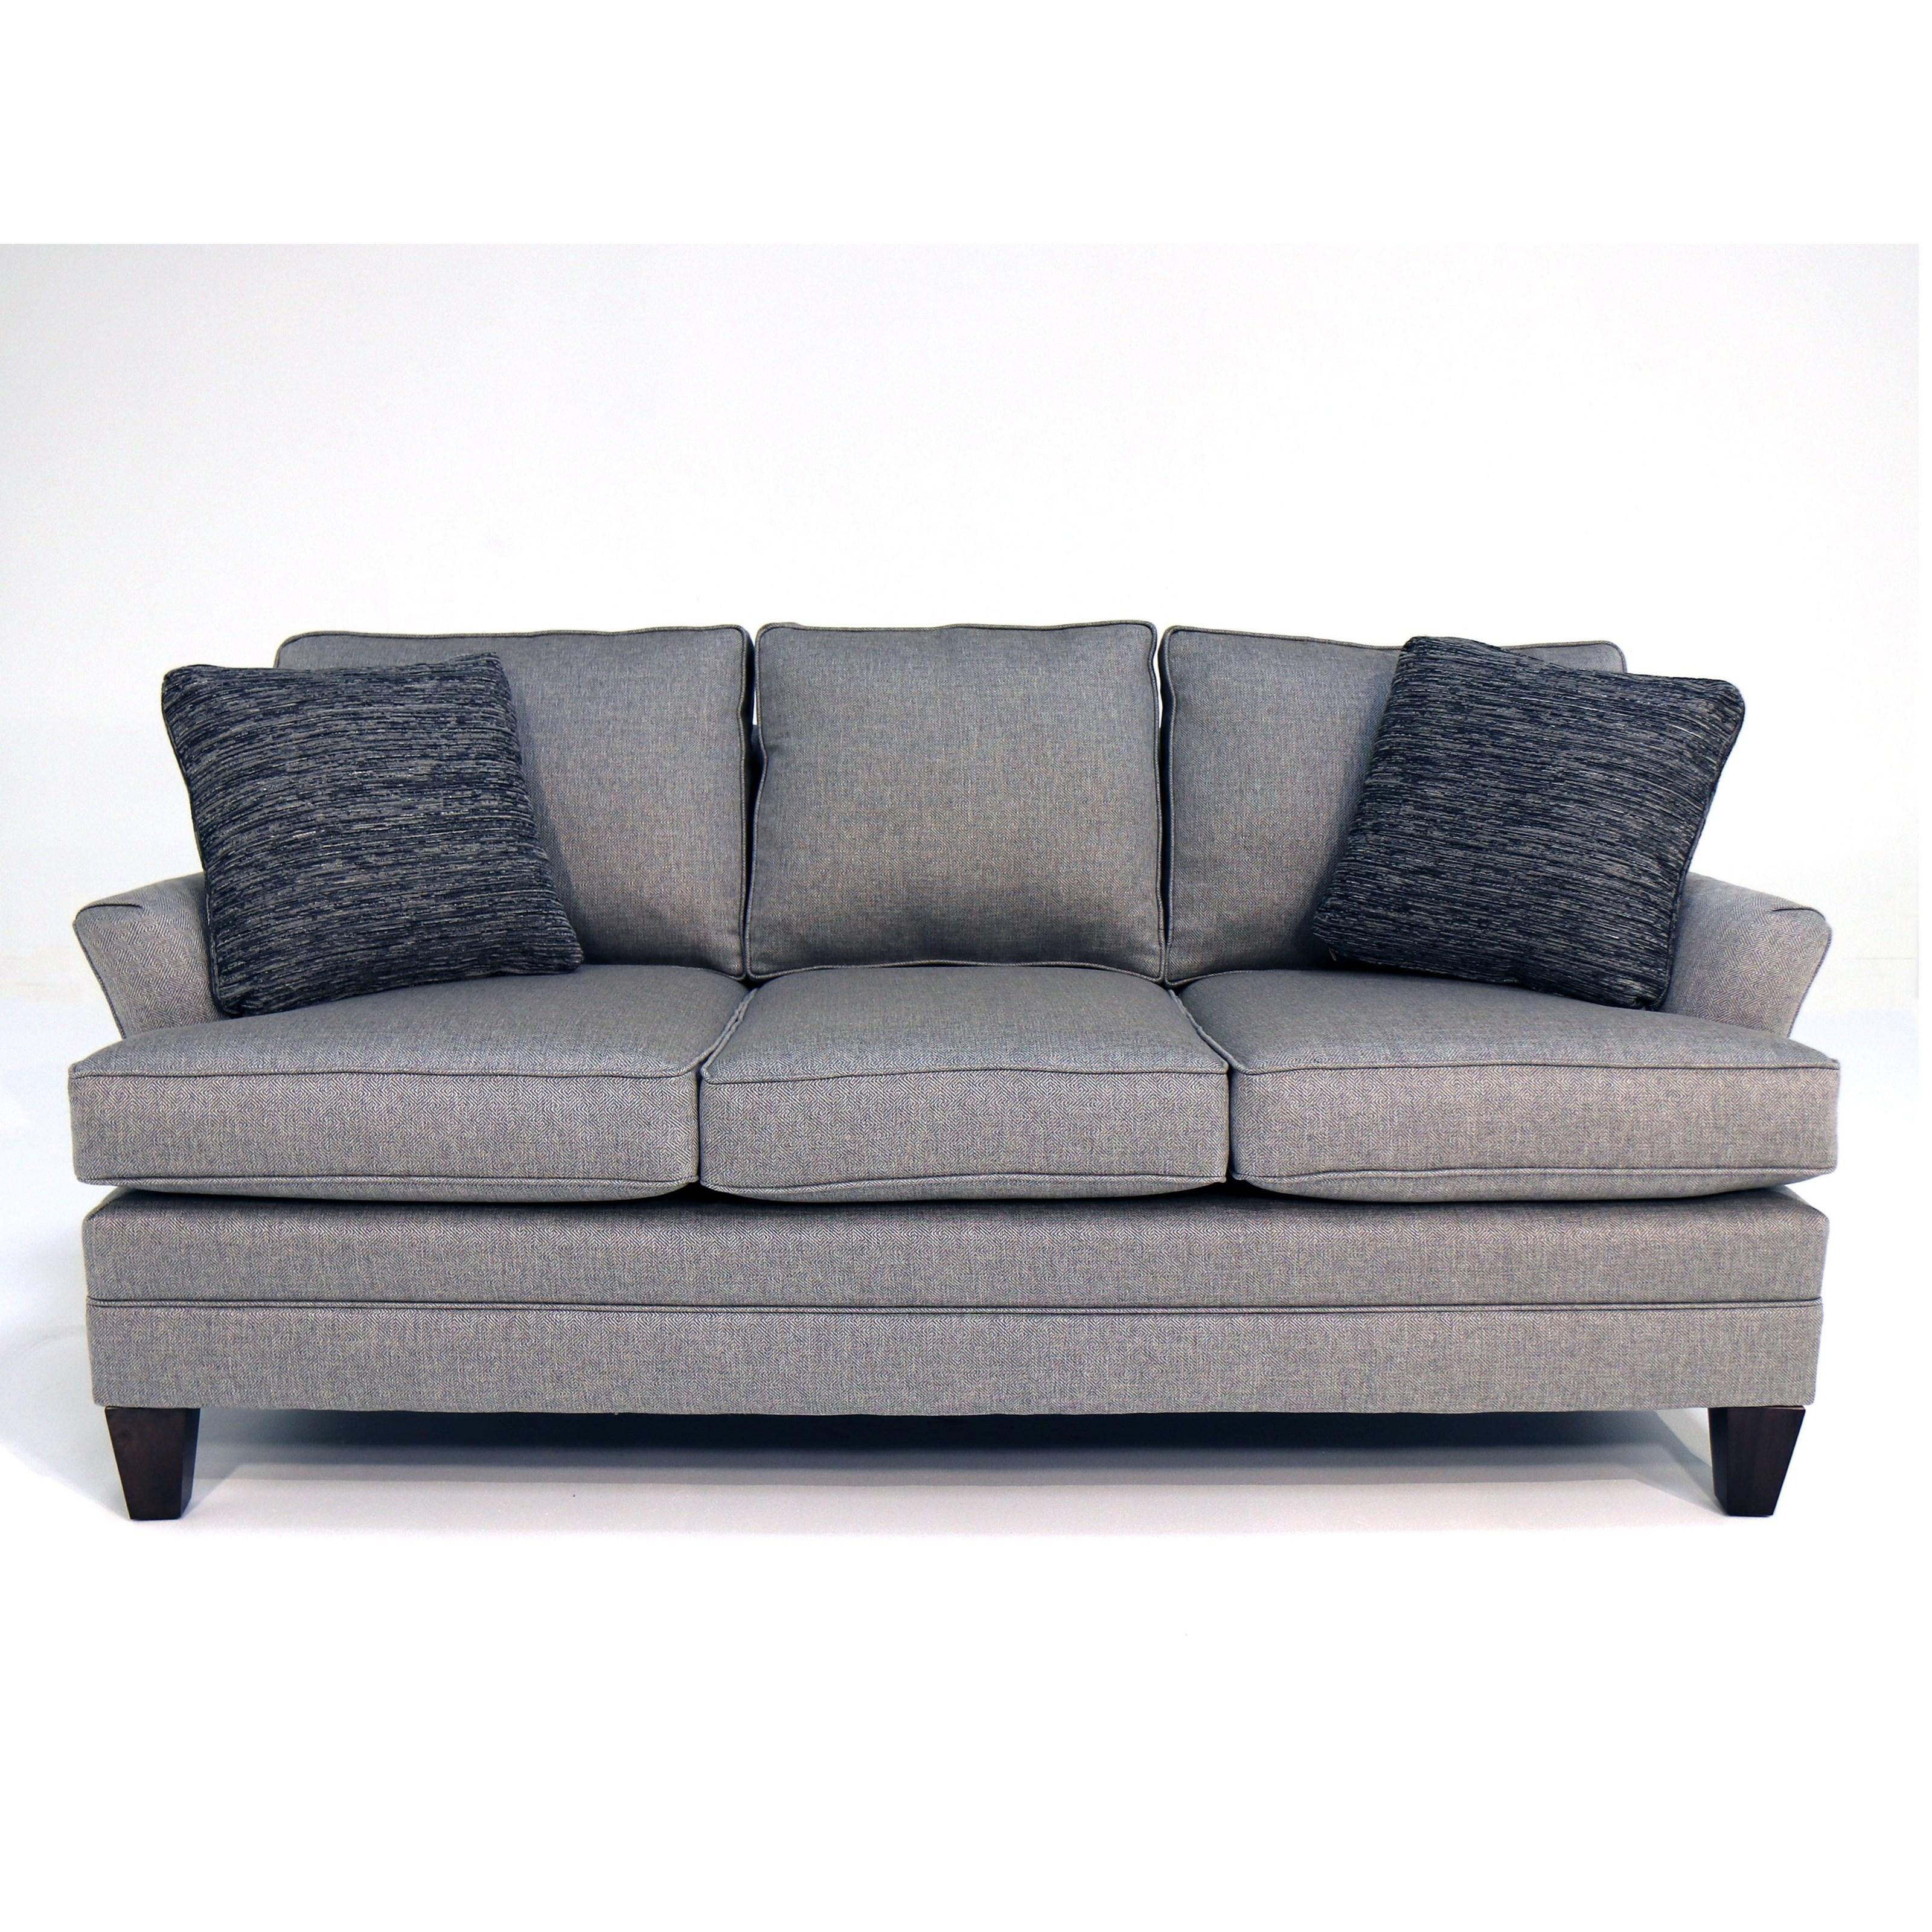 Customizable 75 Inch Apartment Sofa